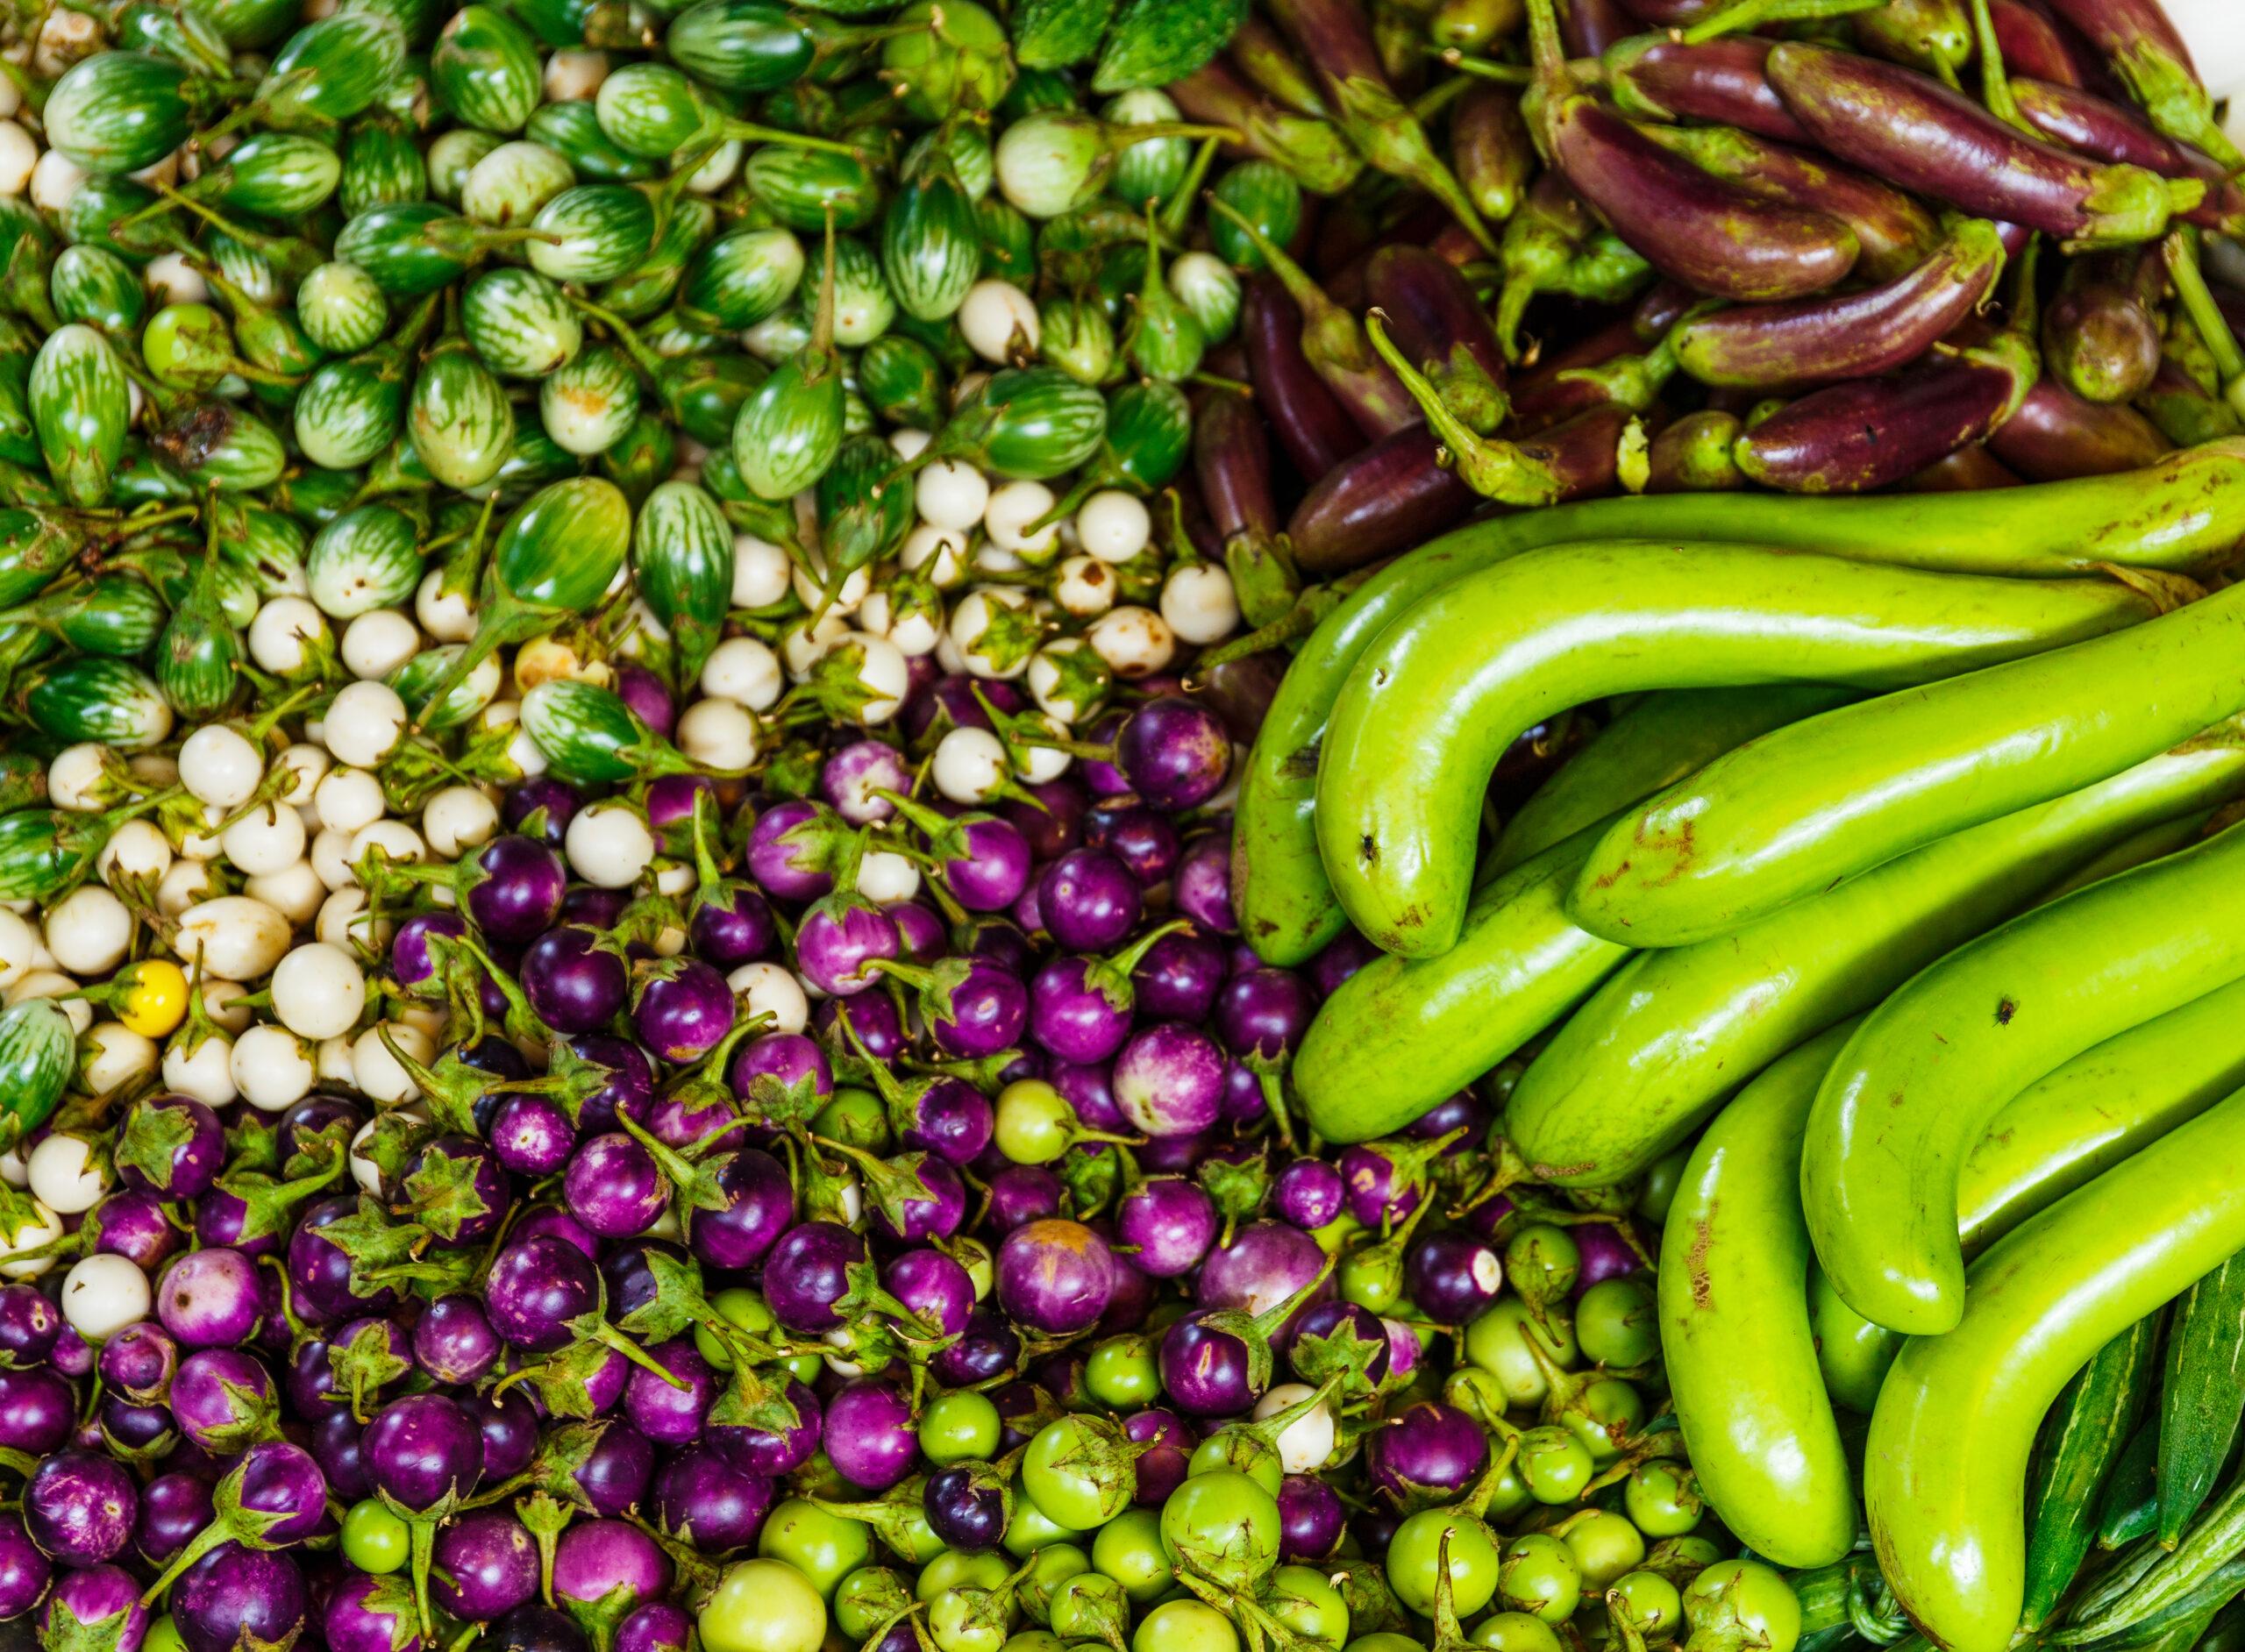 Vegetable in market stall